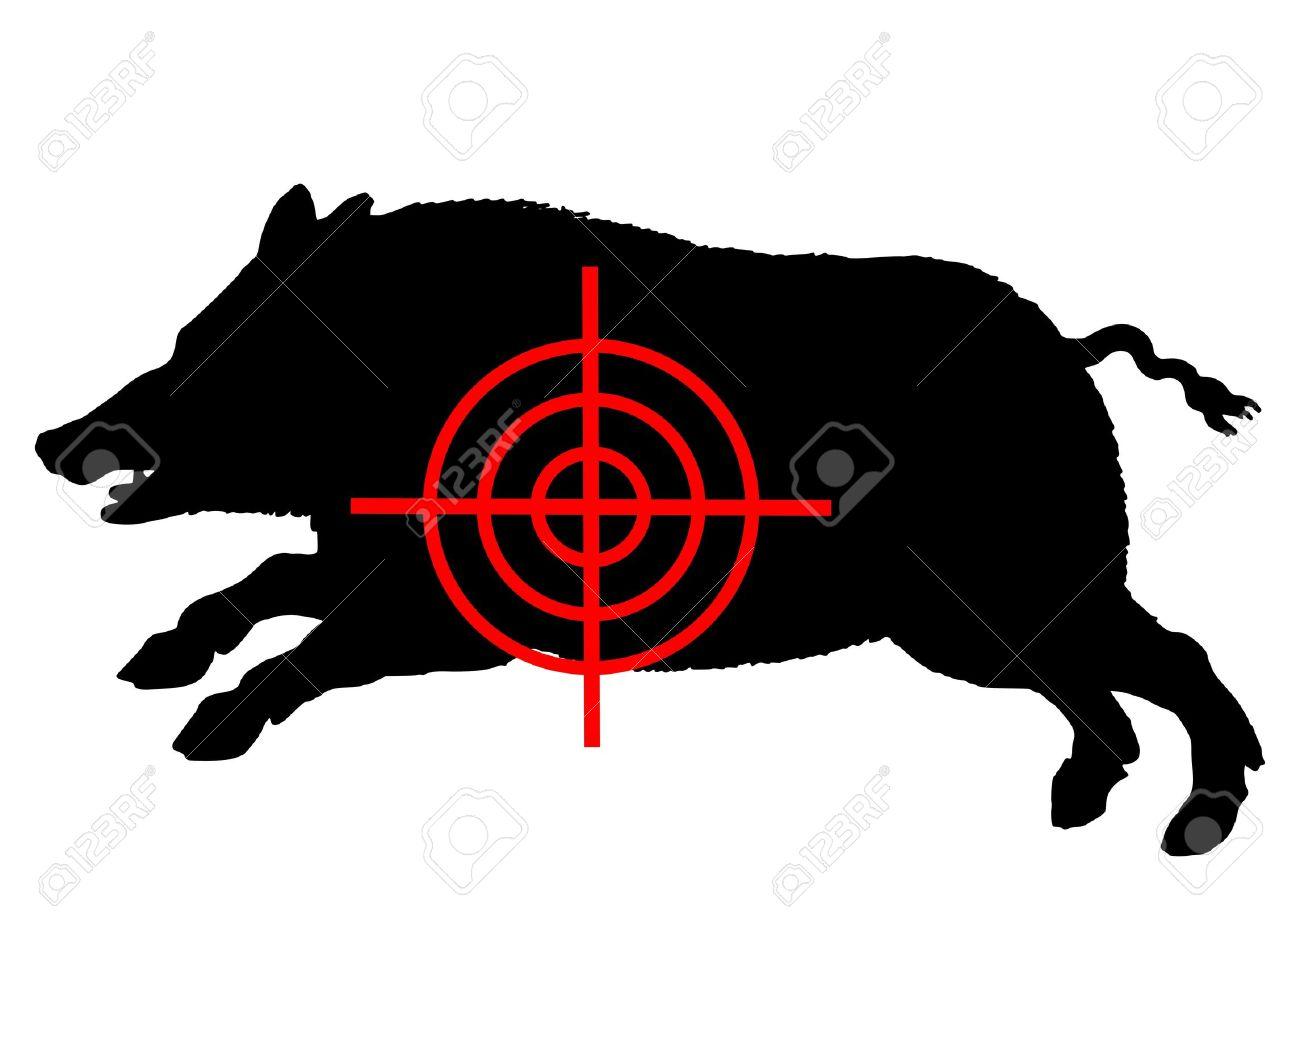 Boar crosslines Stock Vector - 11988440